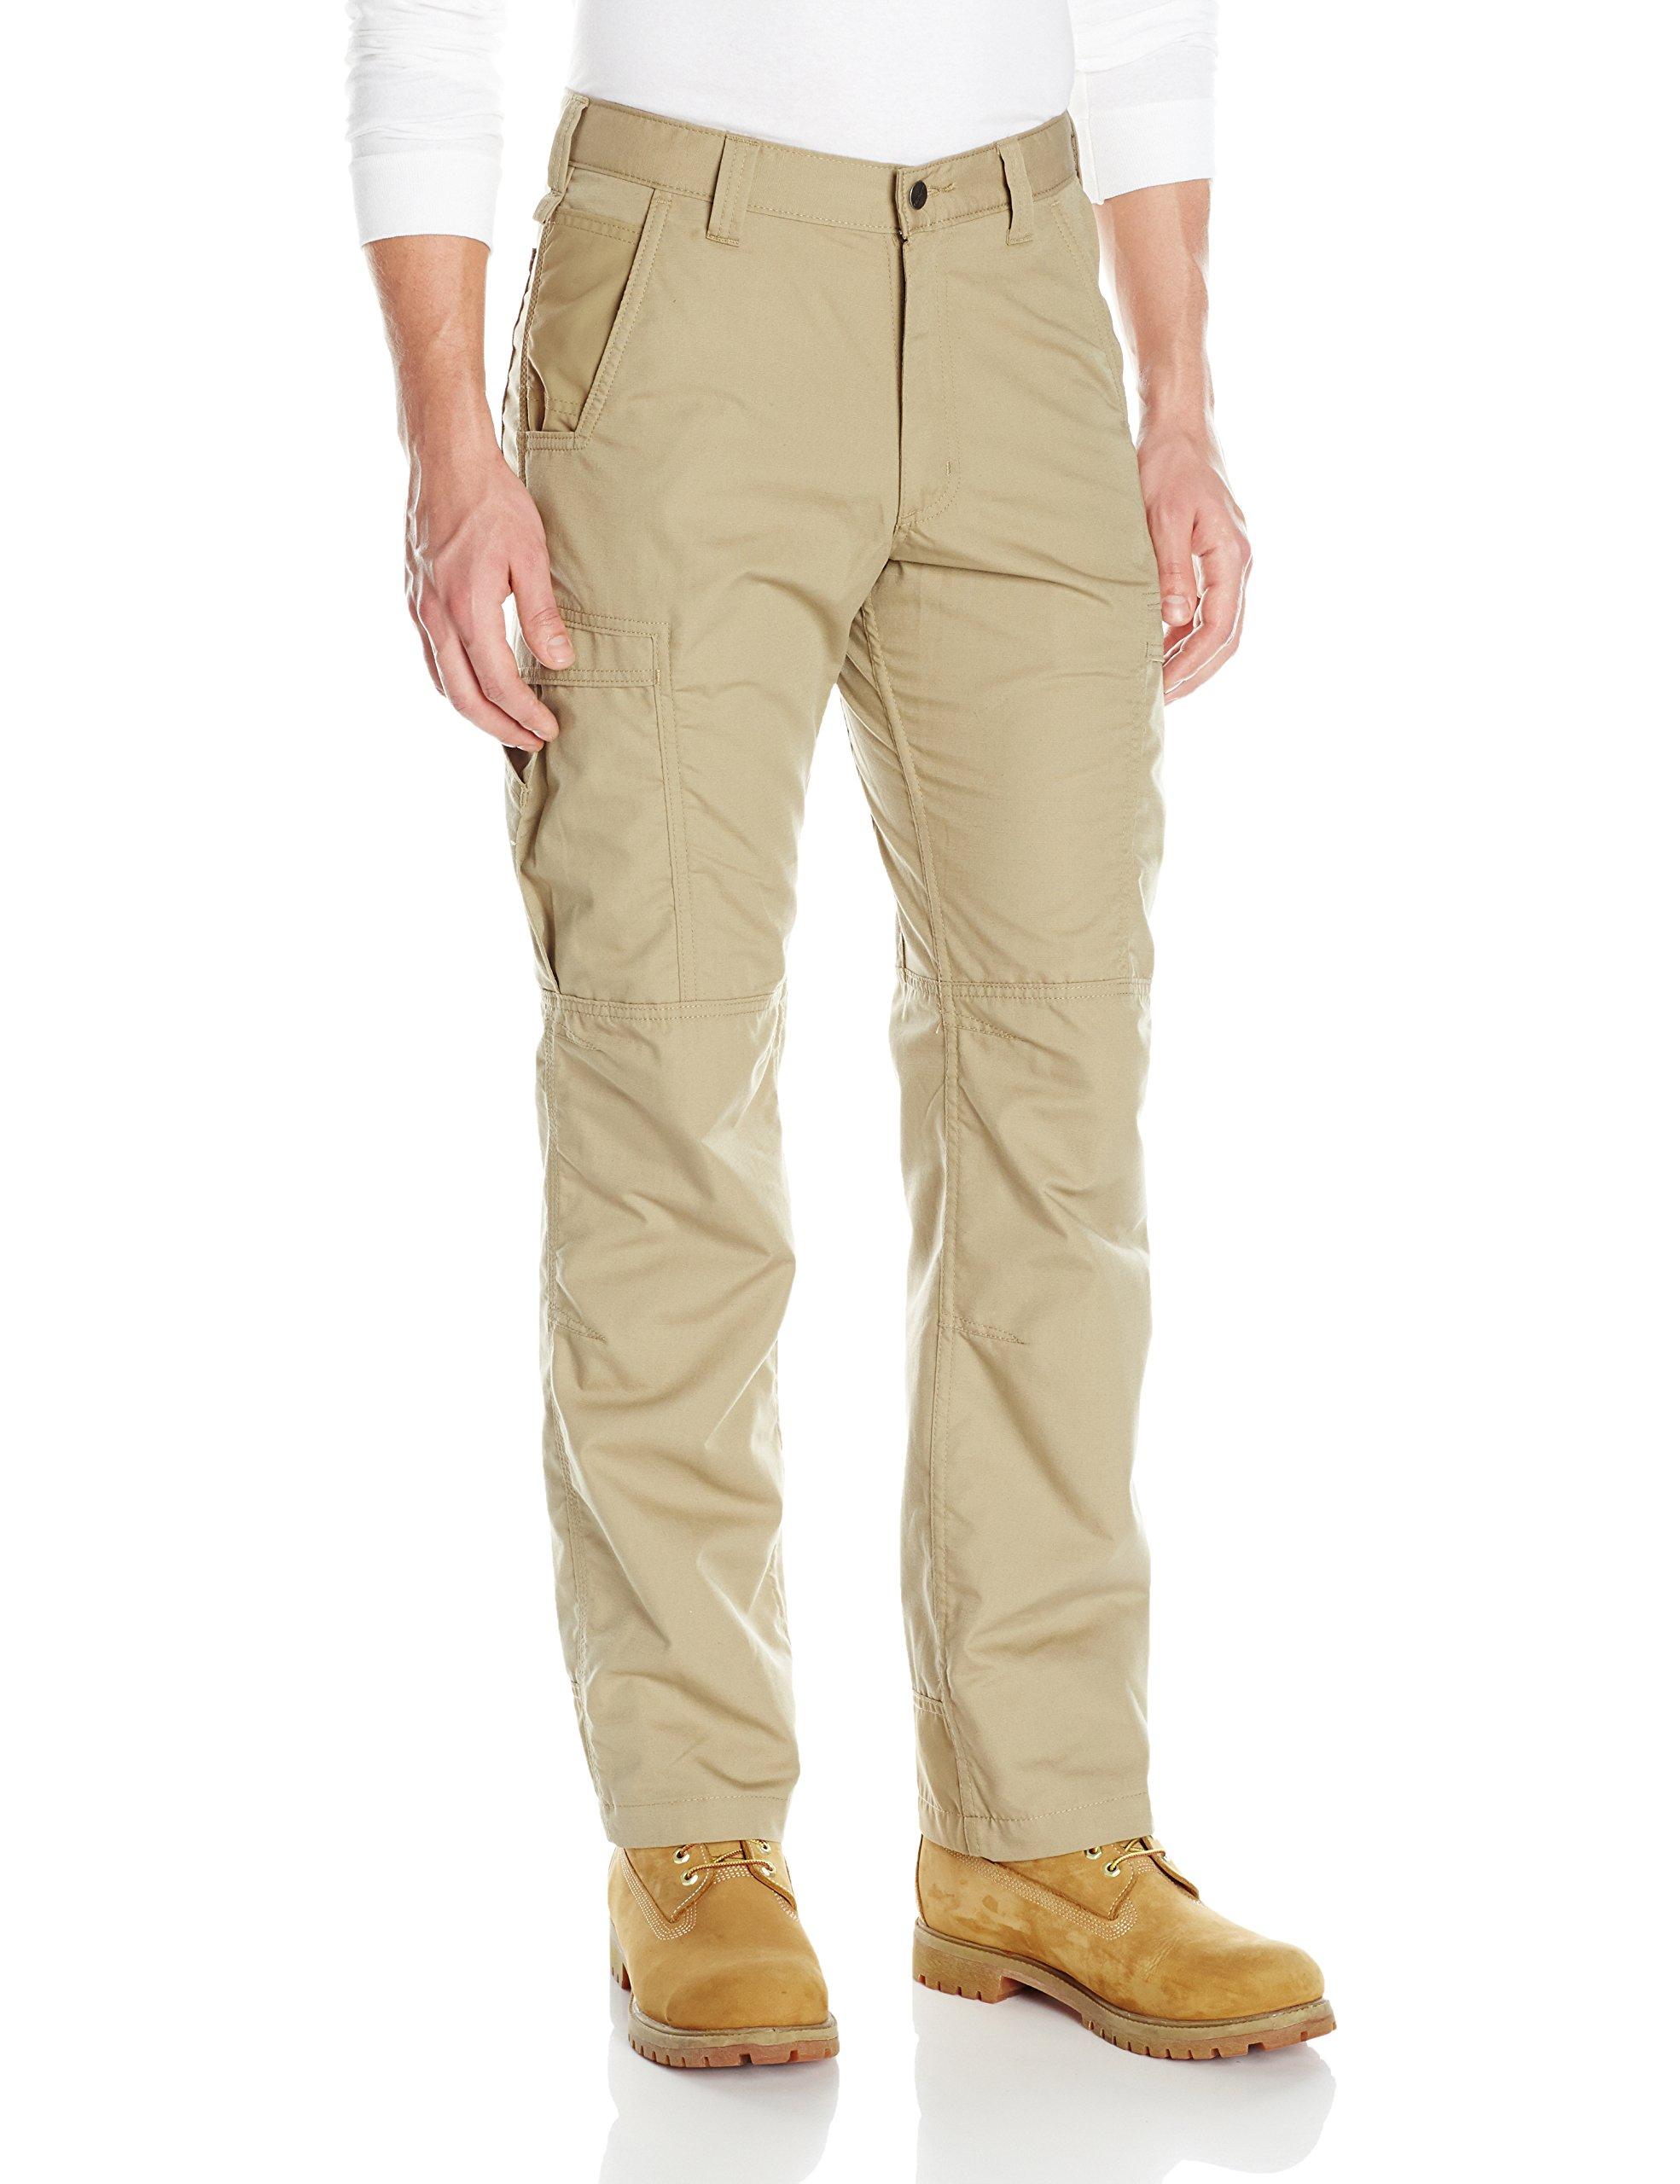 Carhartt Men's Force Extreme Cargo Pant, Dark Khaki, 32W X 32L